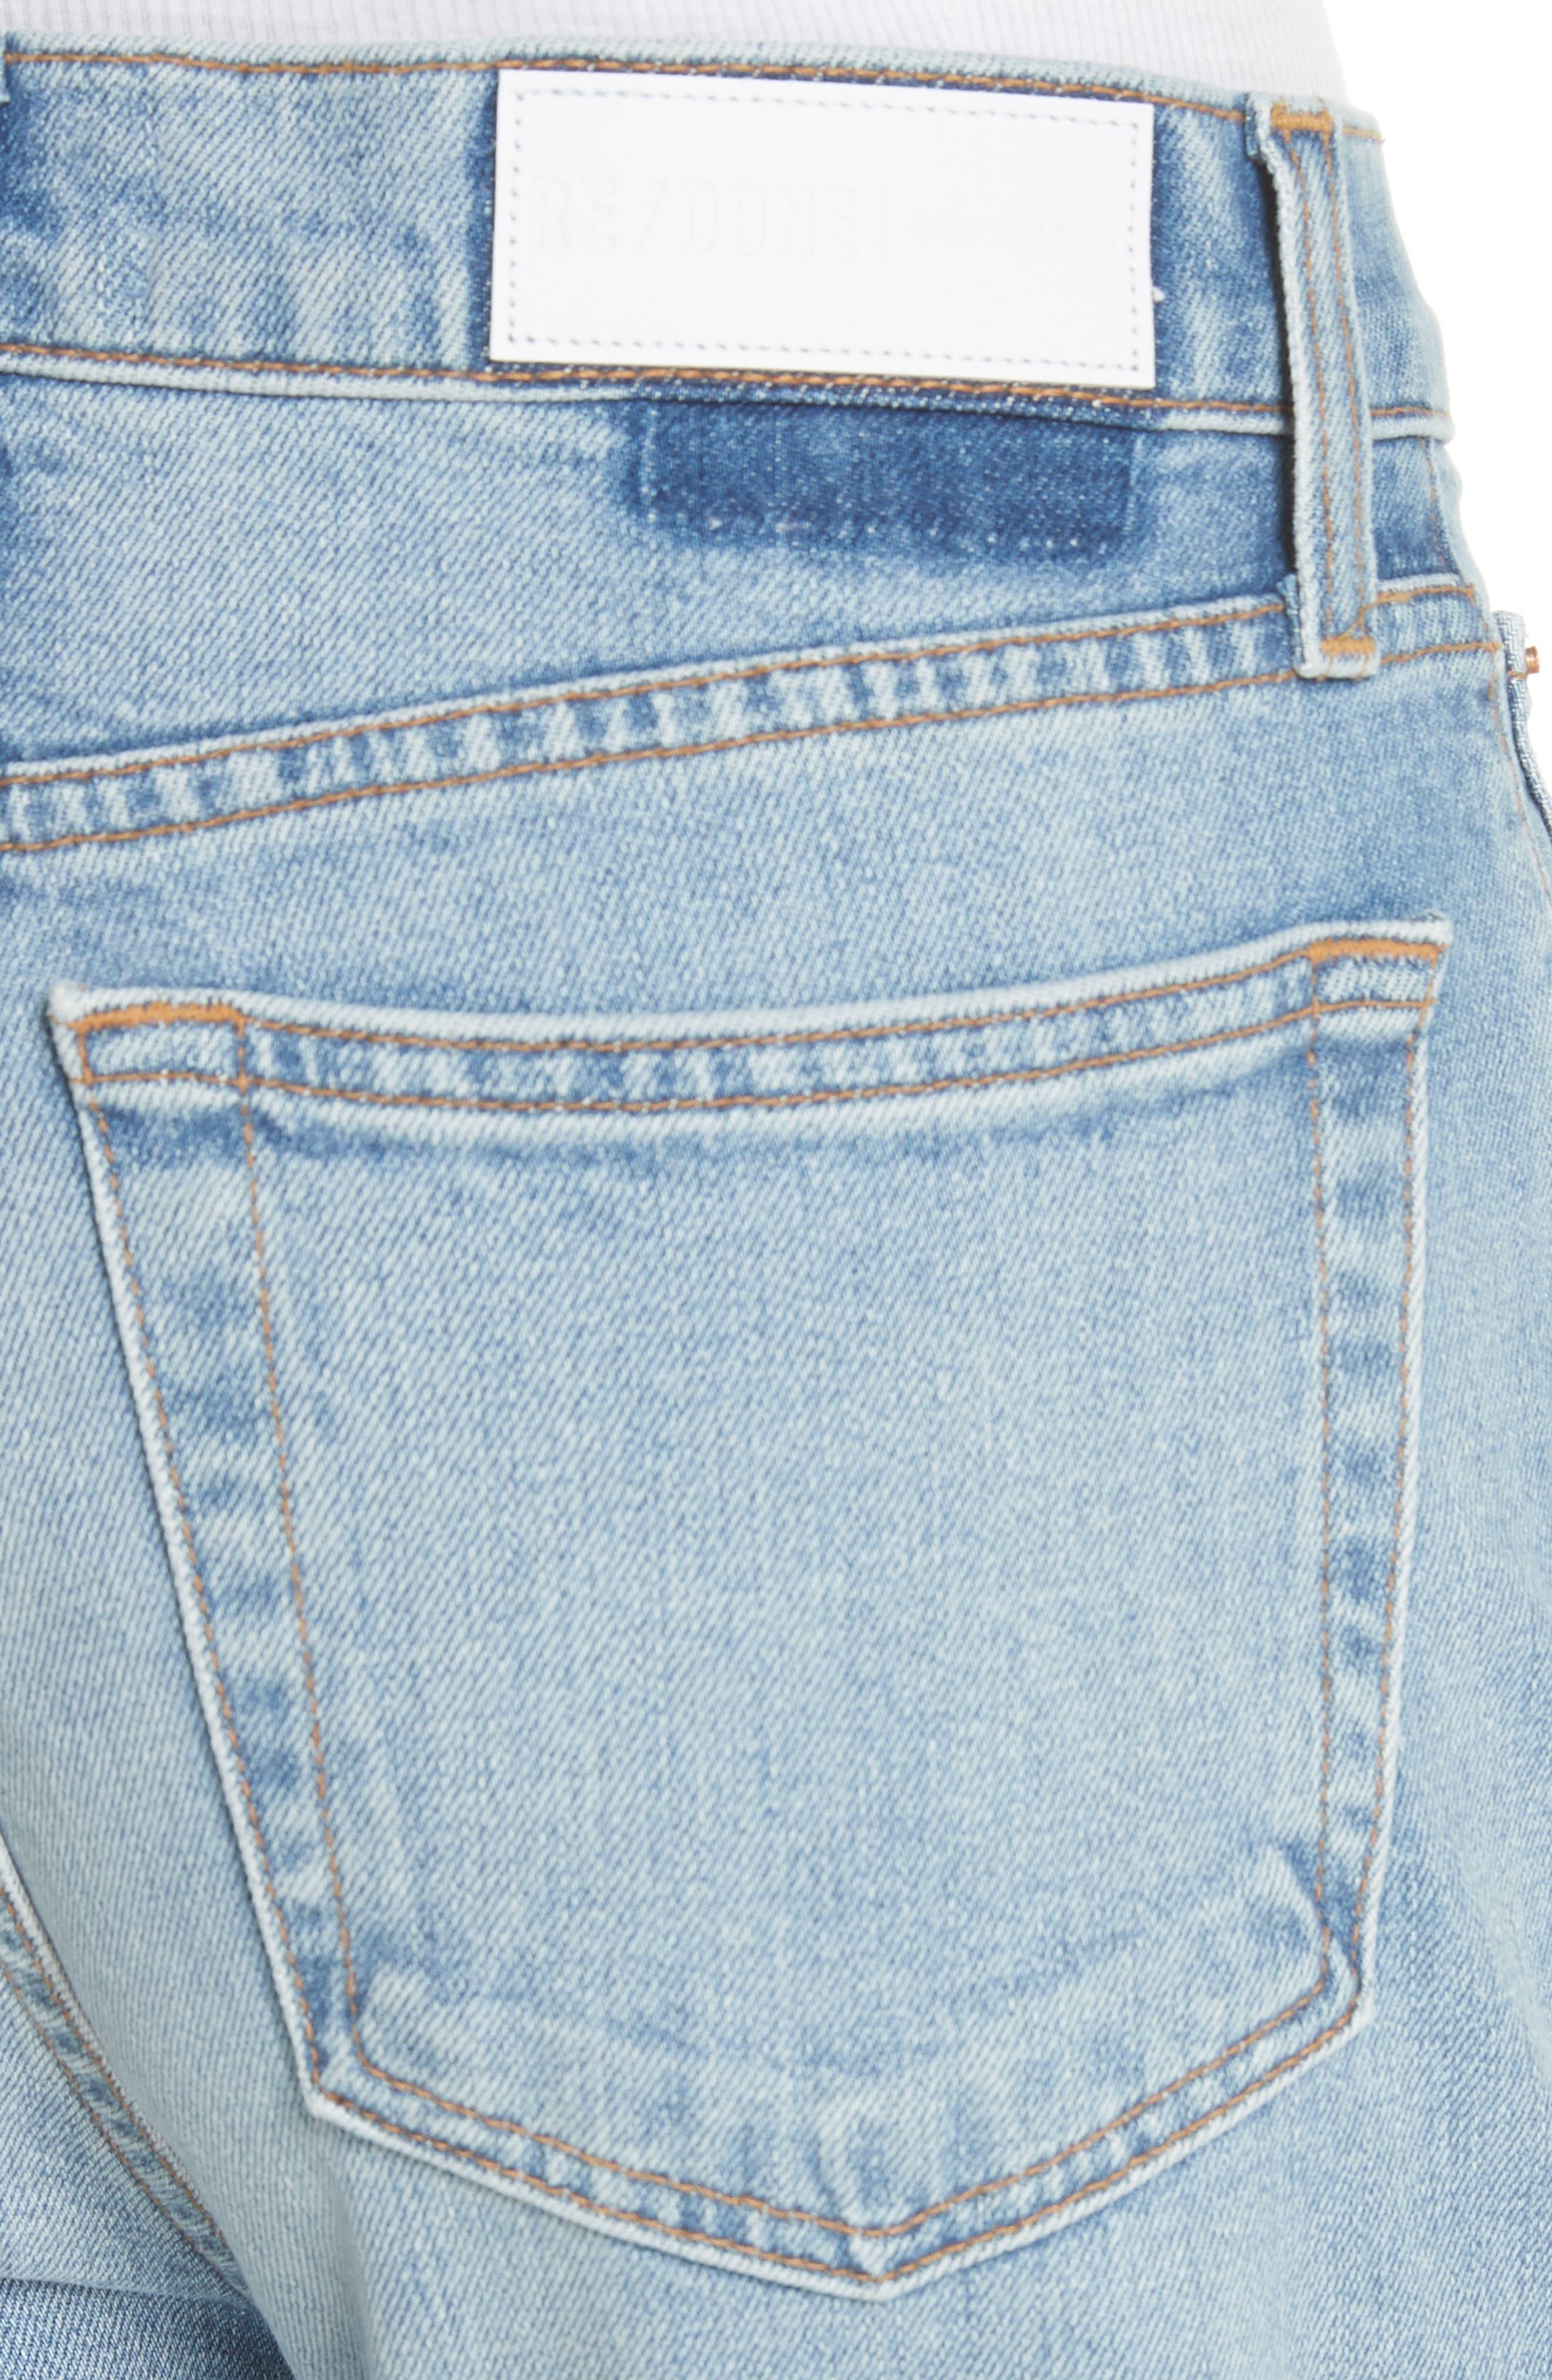 High Waist Crop Jeans,                             Alternate thumbnail 4, color,                             Dark Wash